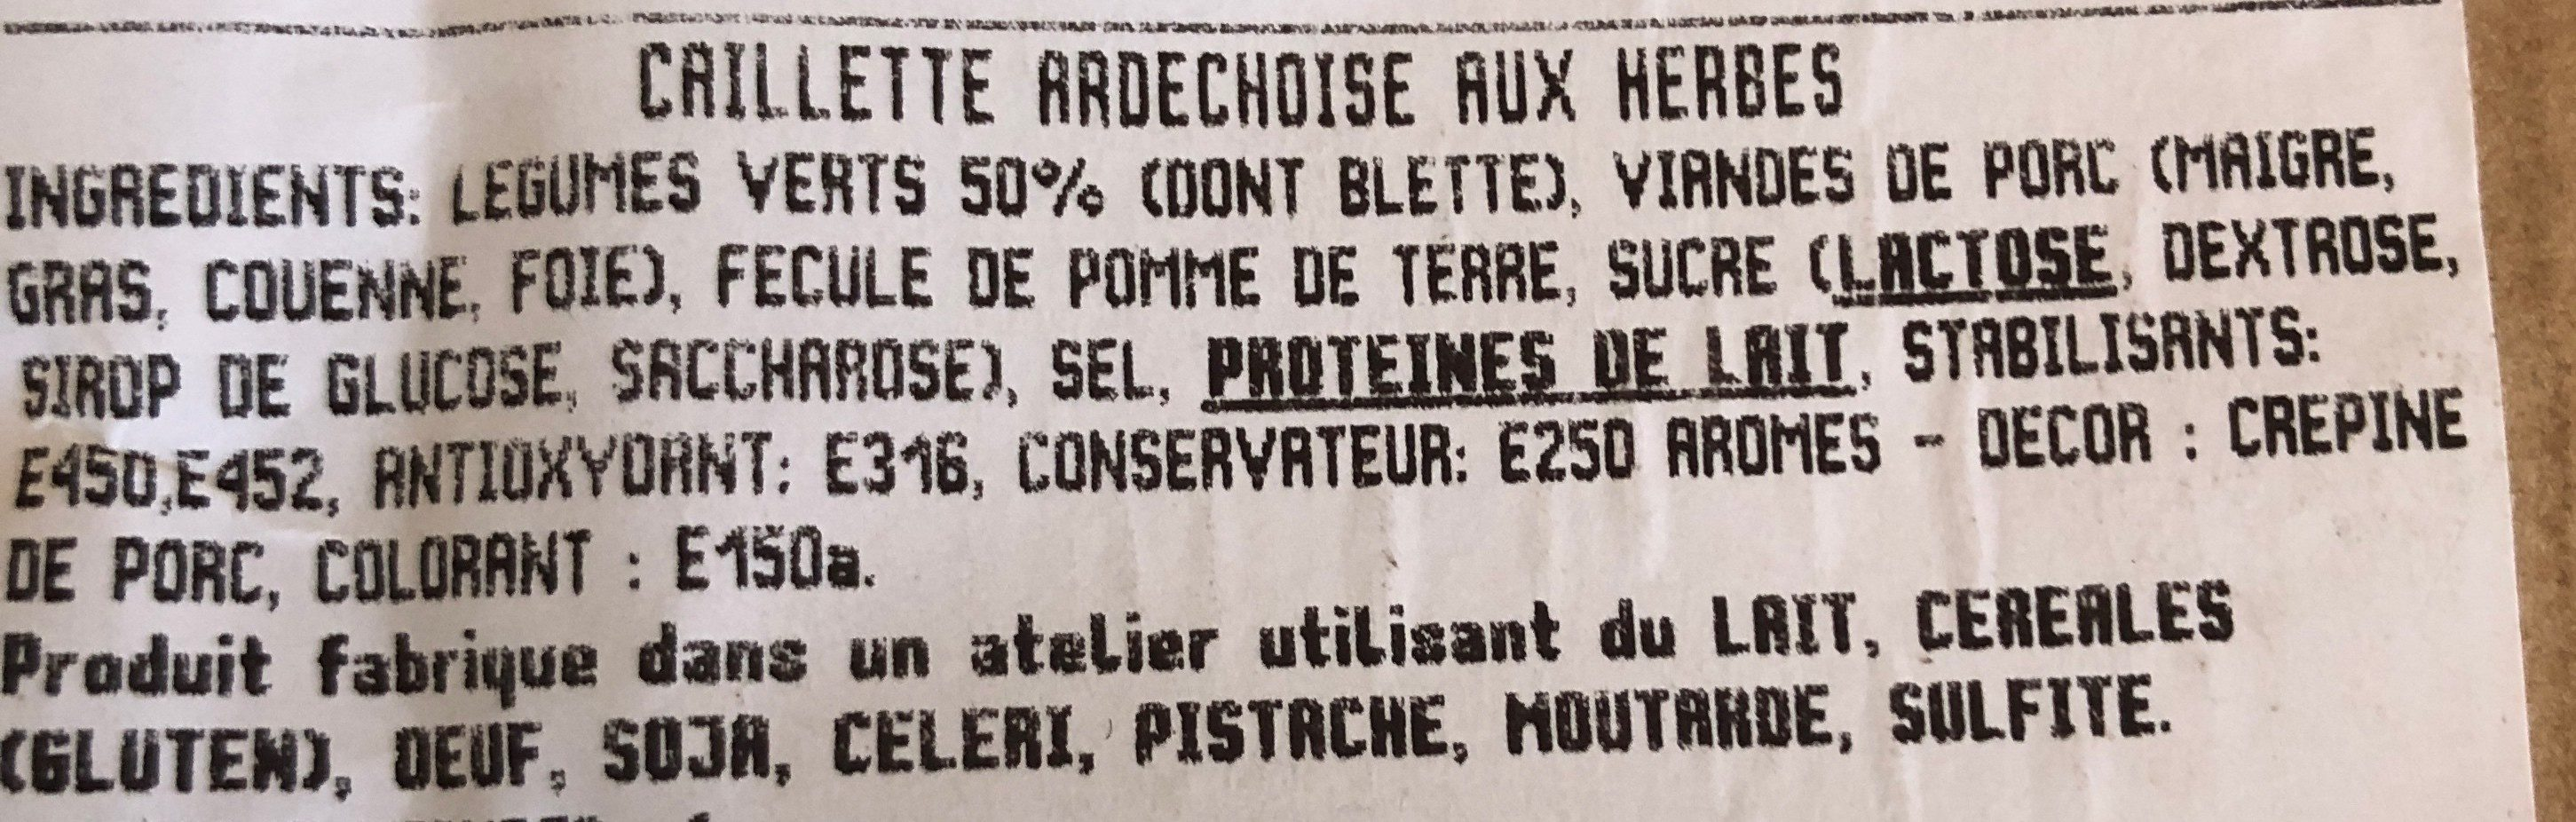 Caillette Ardéchoise aux herbes - Ingrediënten - fr